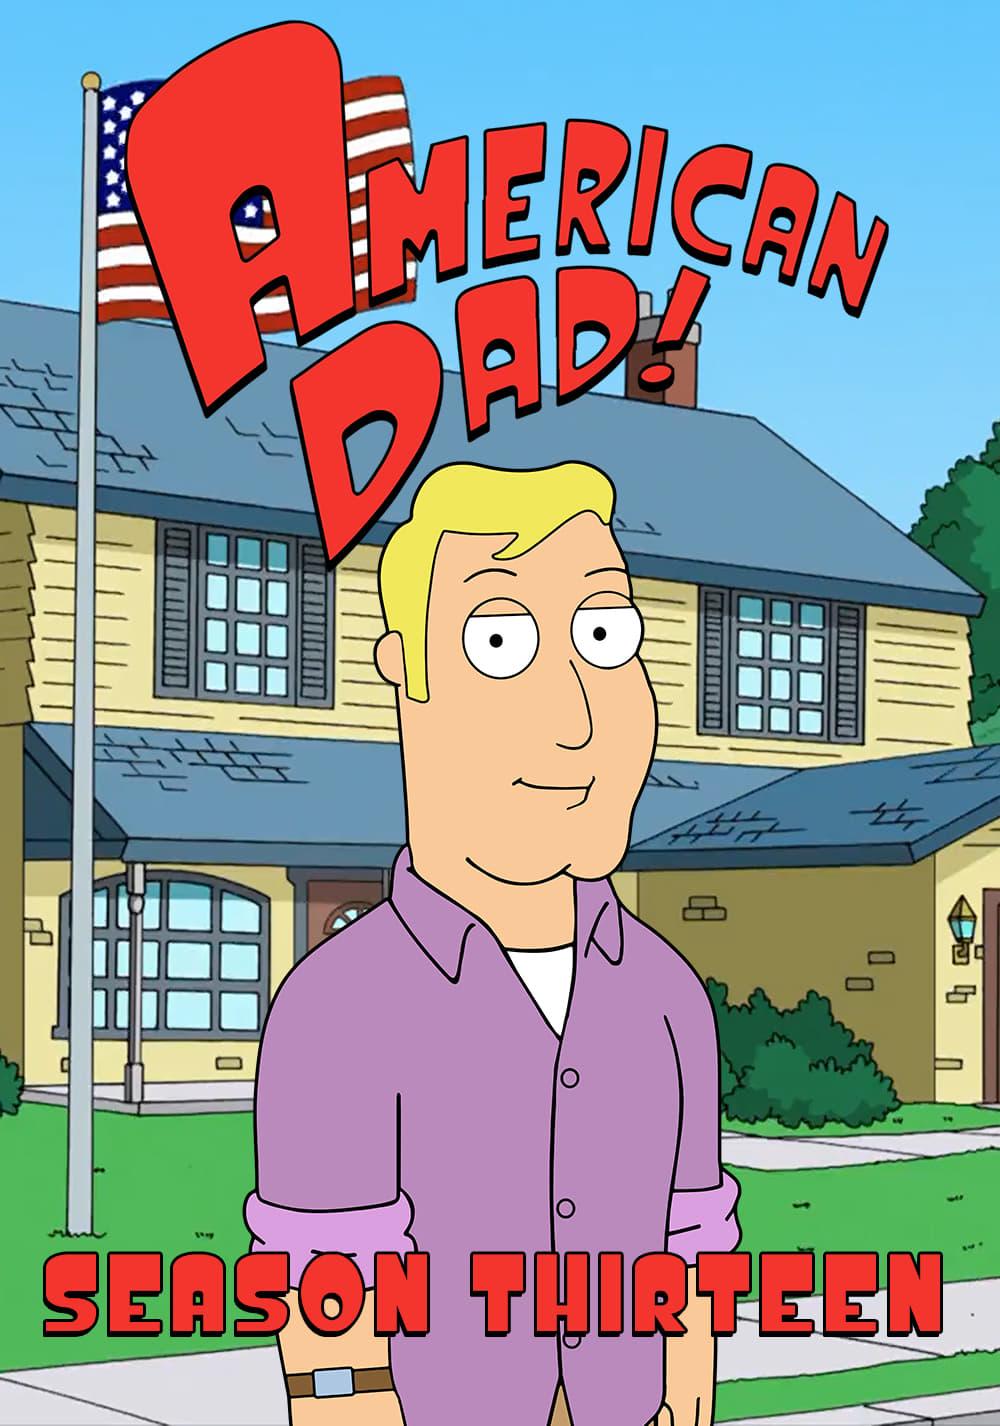 American Dad! Season 13